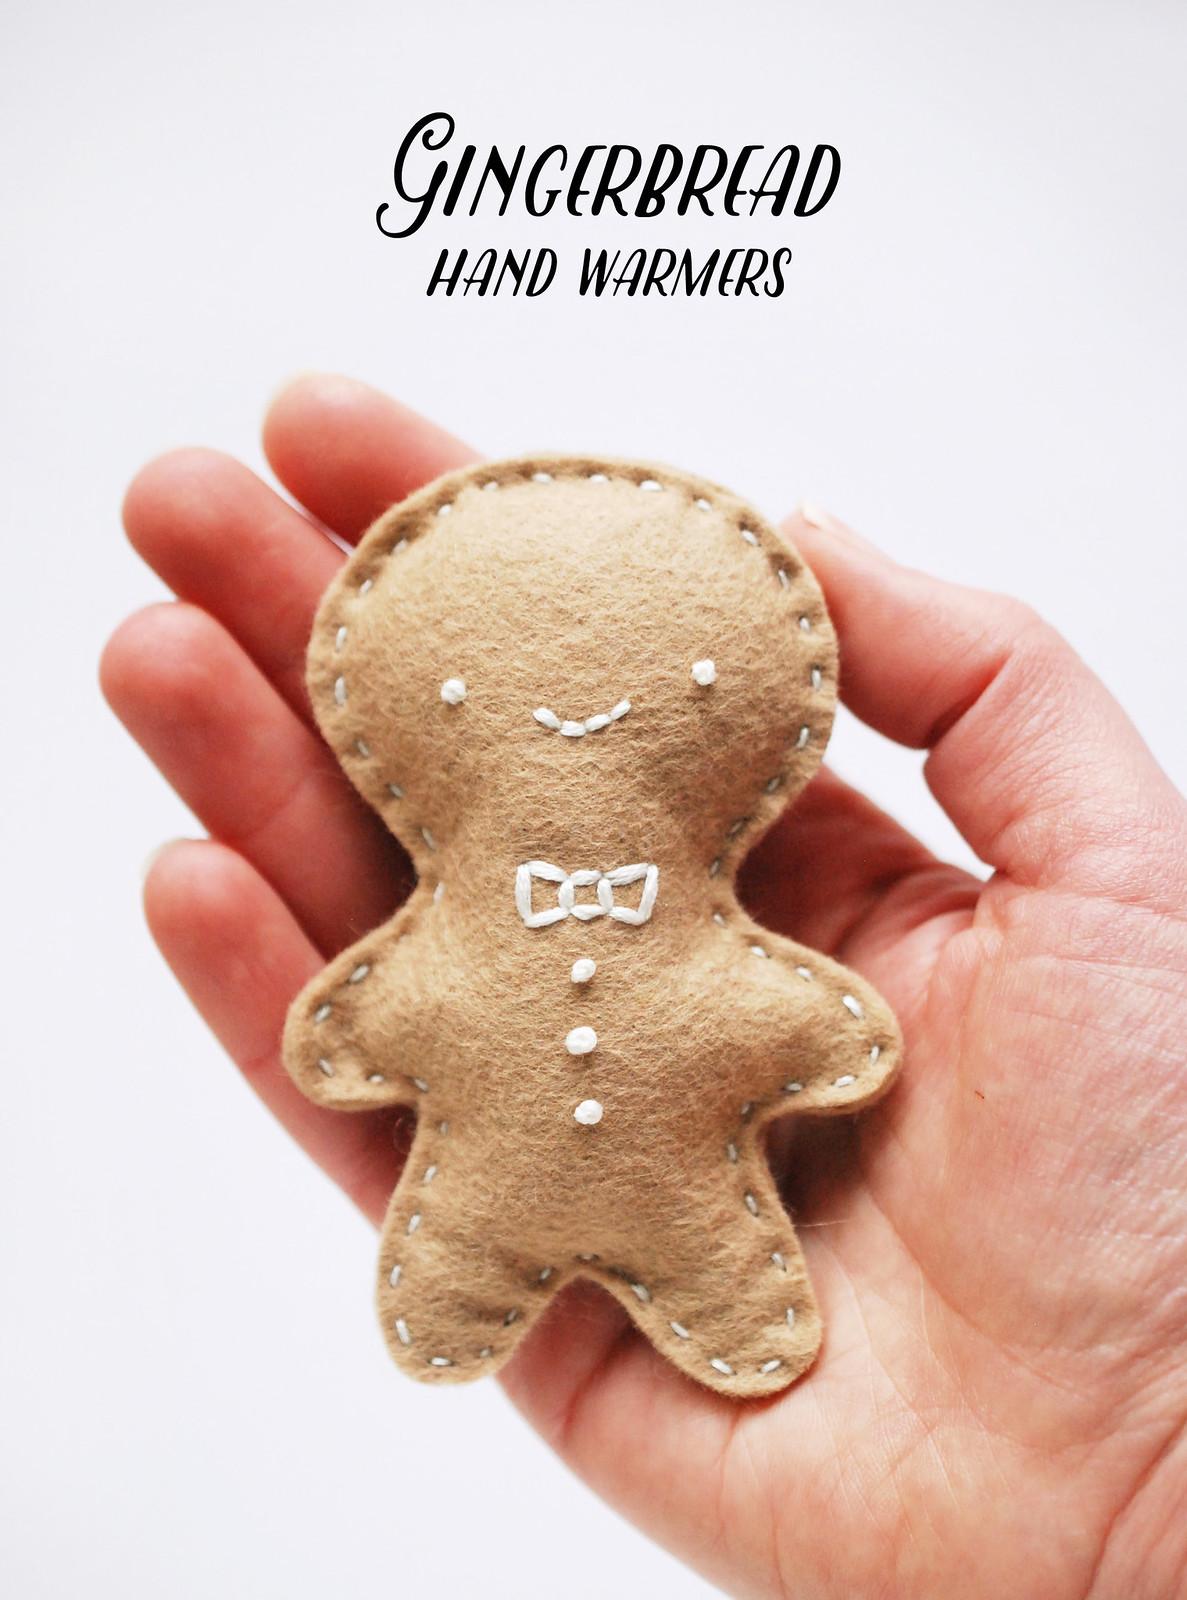 Gingerbread Handwarmers